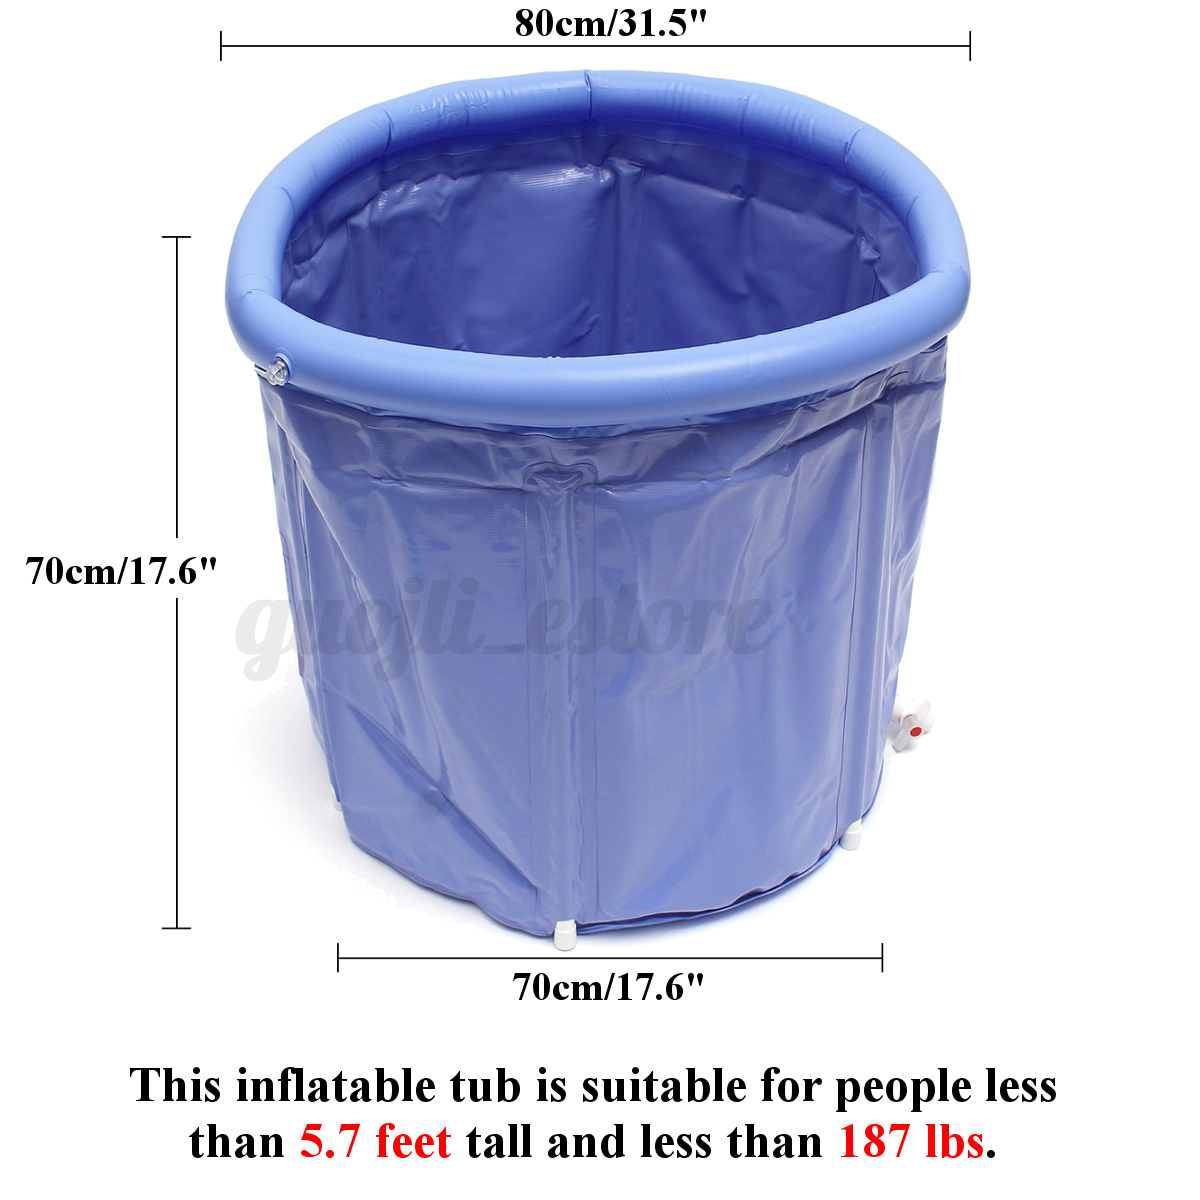 Folding Bathtub Portable Plastic Foldable Water Tub Place Room Spa ...